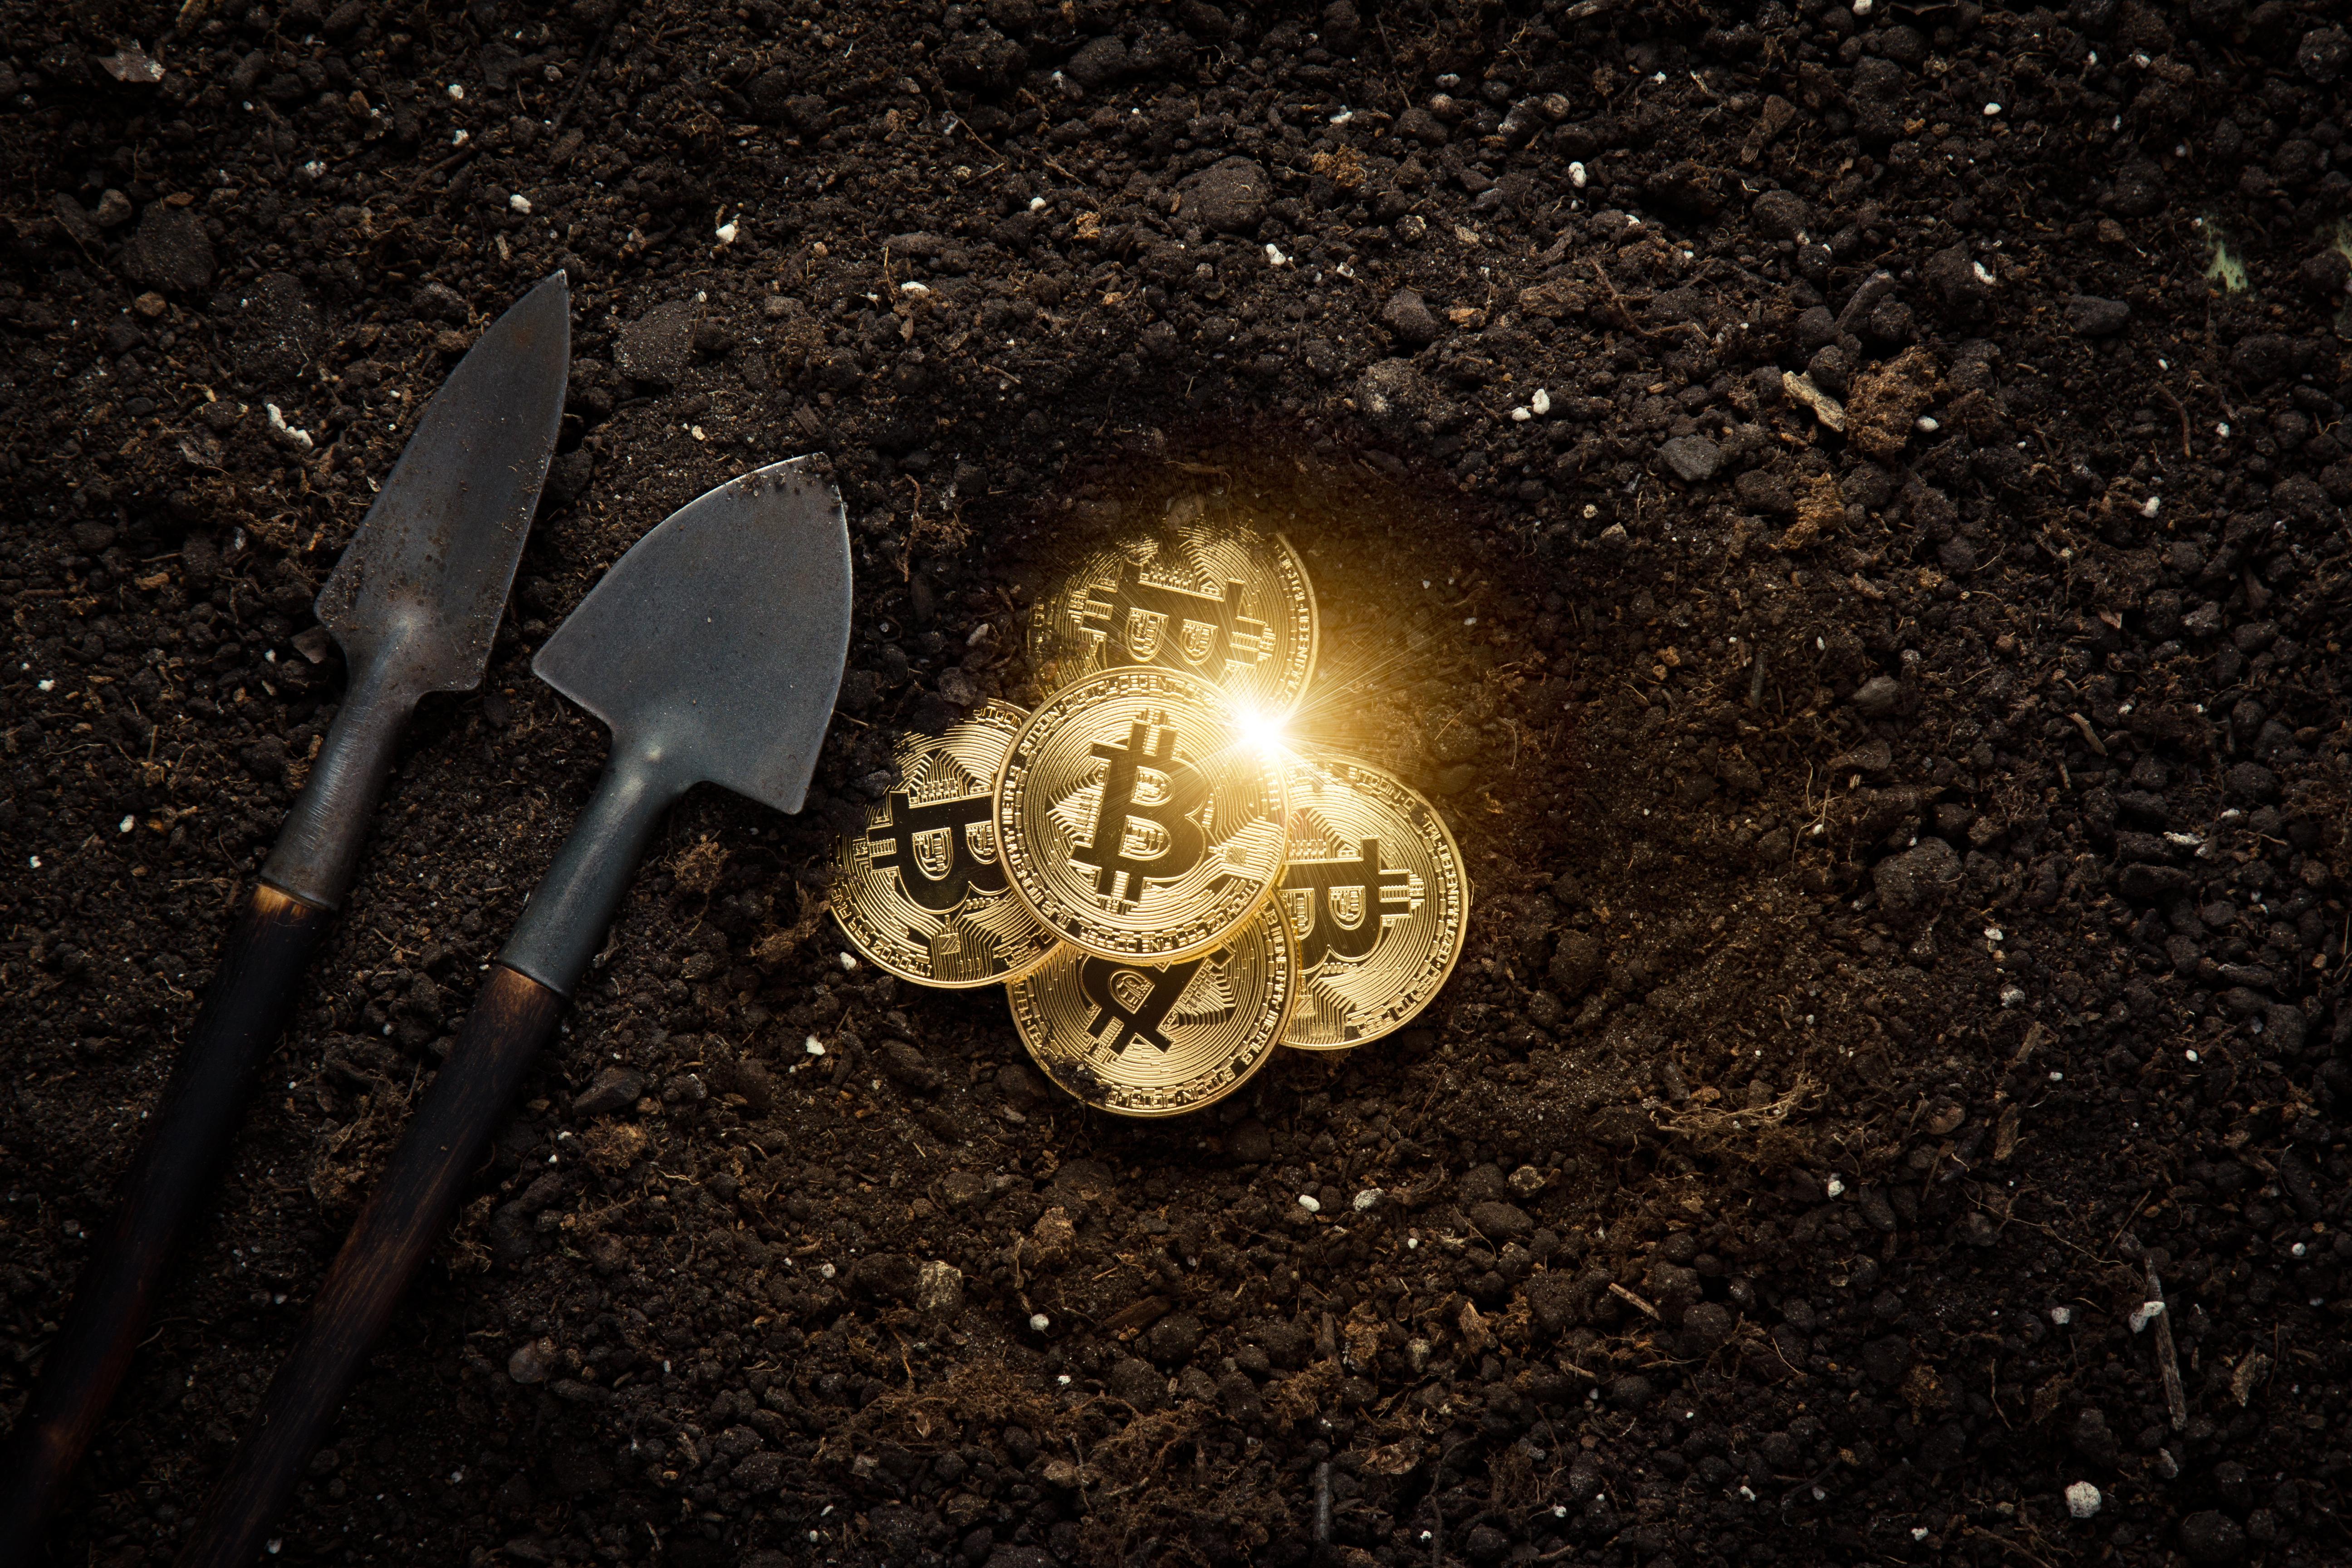 Two Bitcoin Mining Startups Merge to Work on World's Biggest Mining Facility | NewsBTC